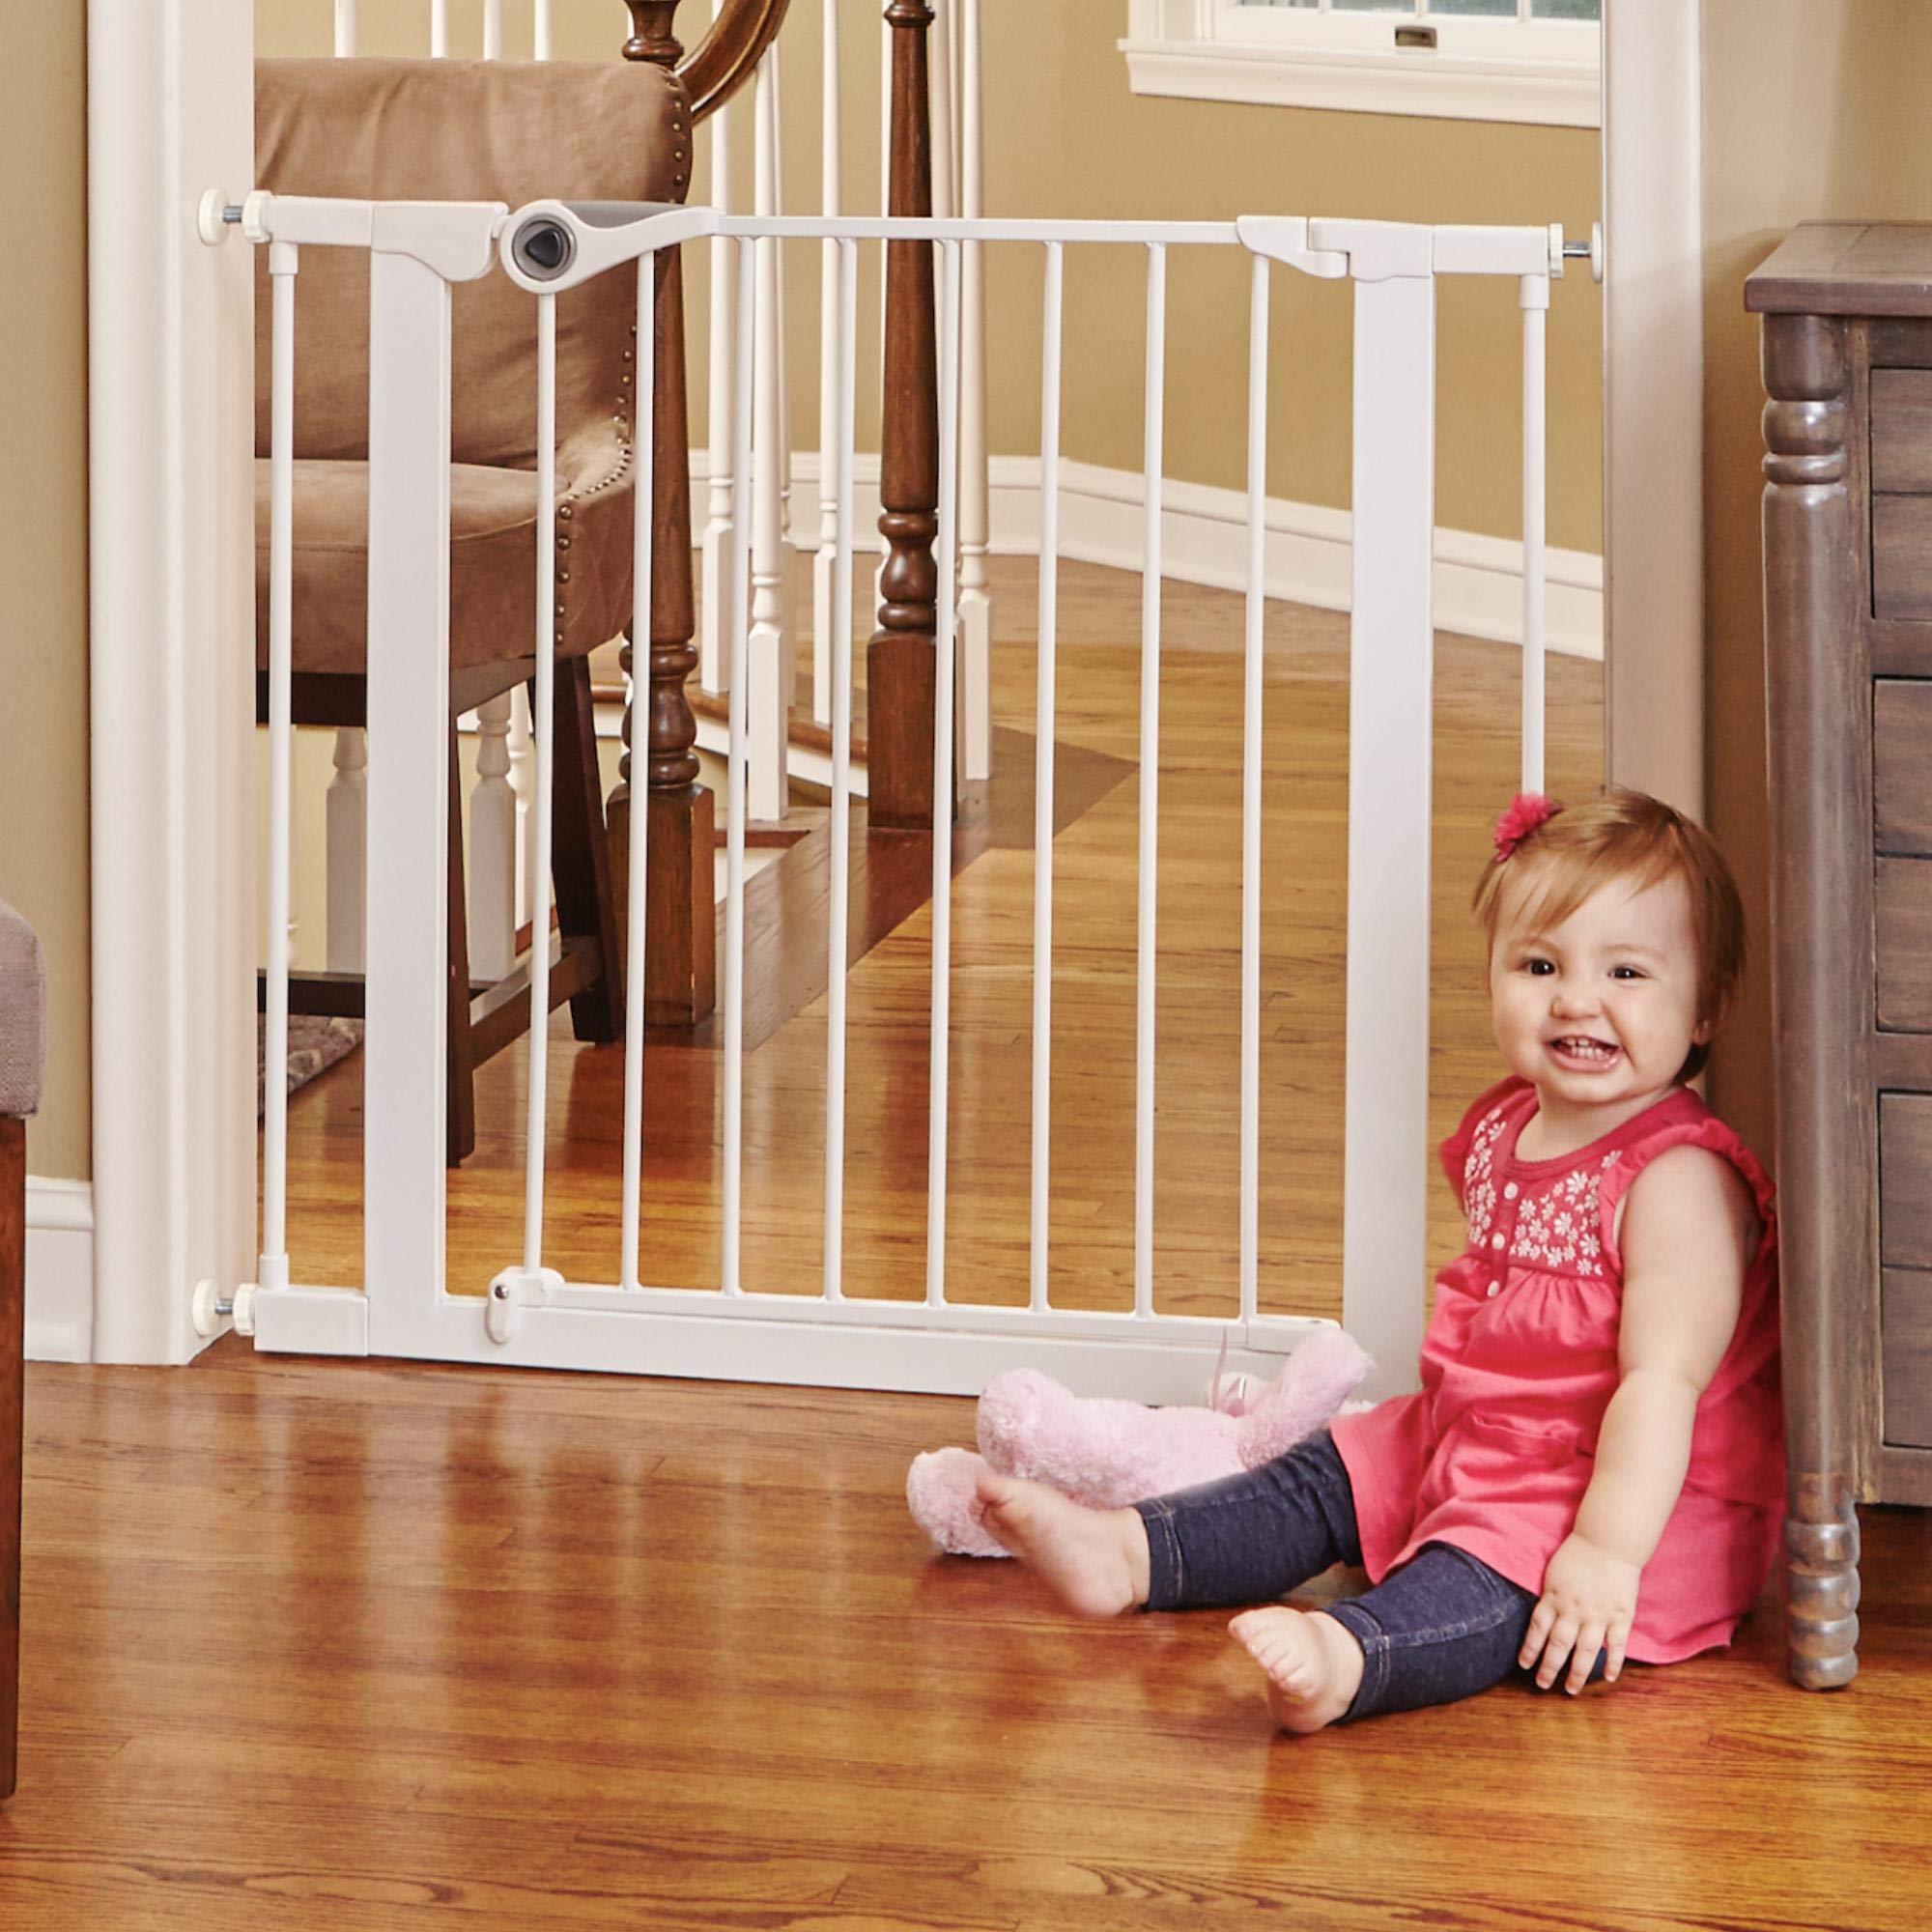 North States 38.1'' Wide Essential Walk-Thru Gate: Ideal for securing hallways or doorways. Extra-Wide Doorway. Pressure Mount. Fits 29.8'' - 38.1'' Wide (30'' Tall, White) by North States